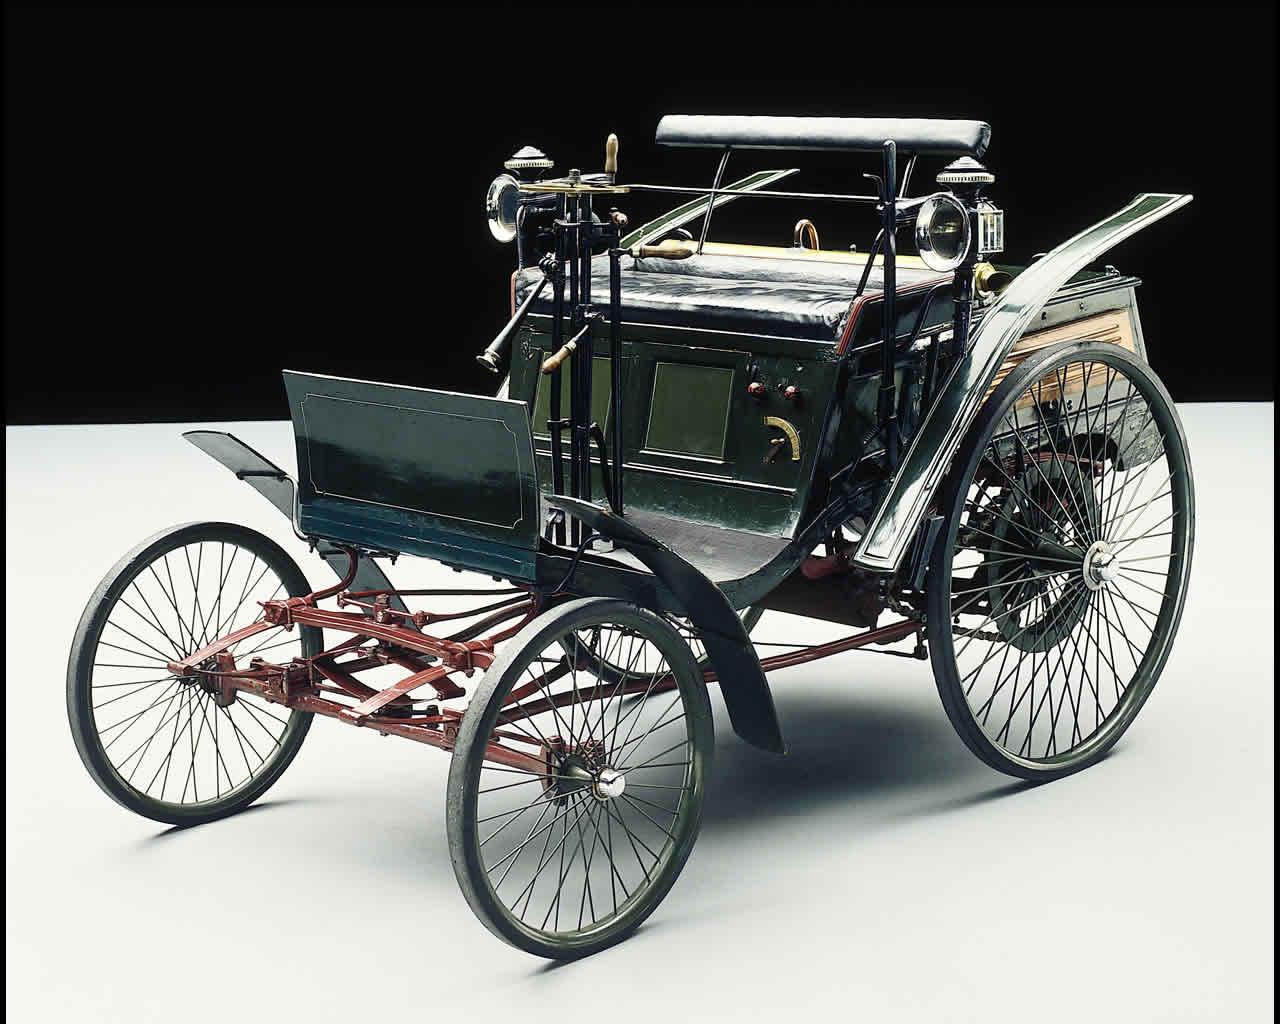 Unusual First Car Invention Contemporary - Classic Cars Ideas - boiq ...